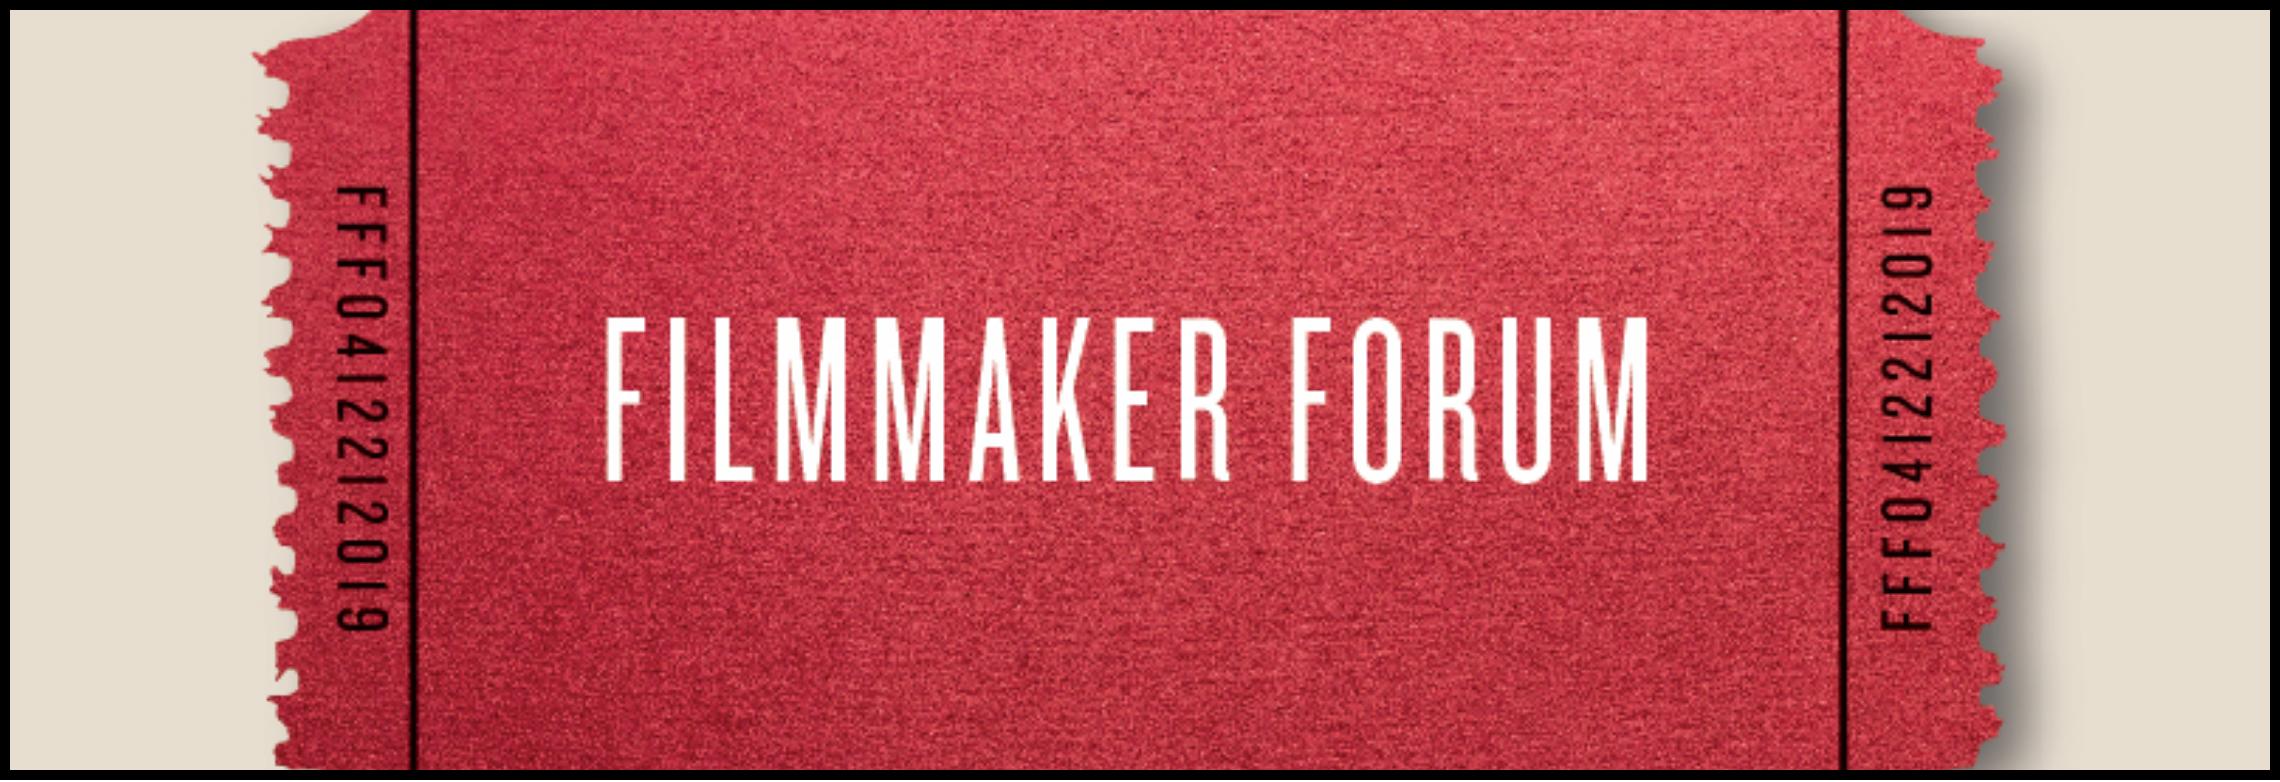 Foster Wilson Florida Film Festival Filmmaker Forum 2019.png